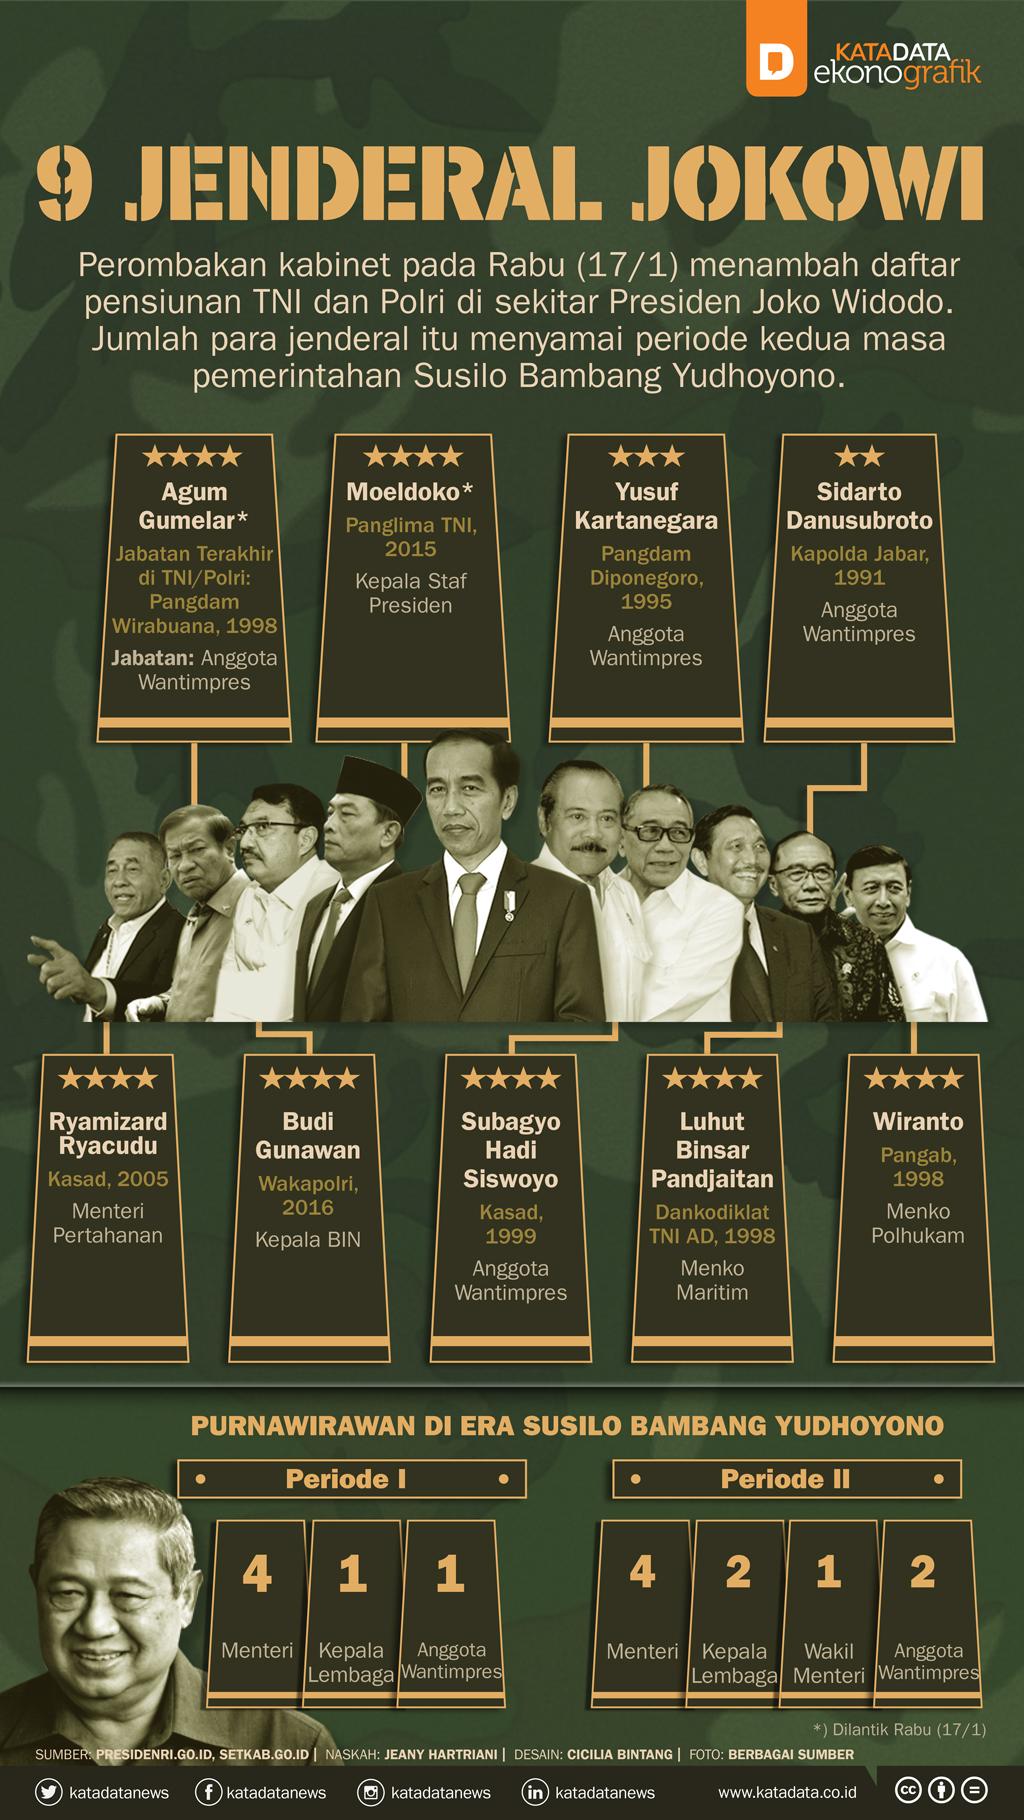 9 Jenderal Jokowi